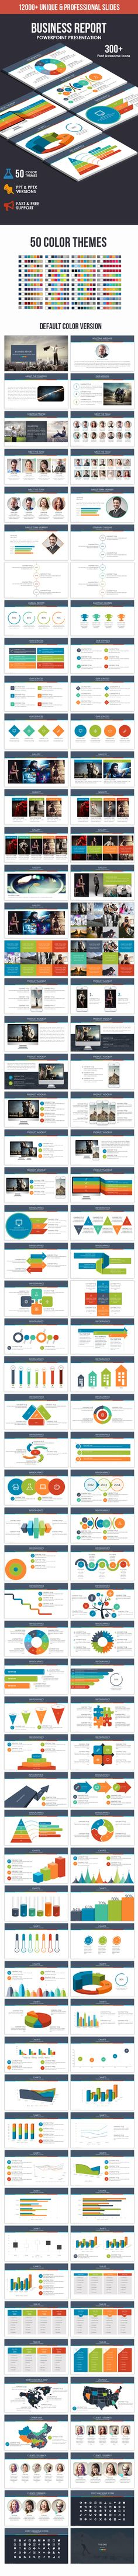 Eid-ul-Fitr 11 - PowerPoint Templates | Green PowerPoint Templates ...